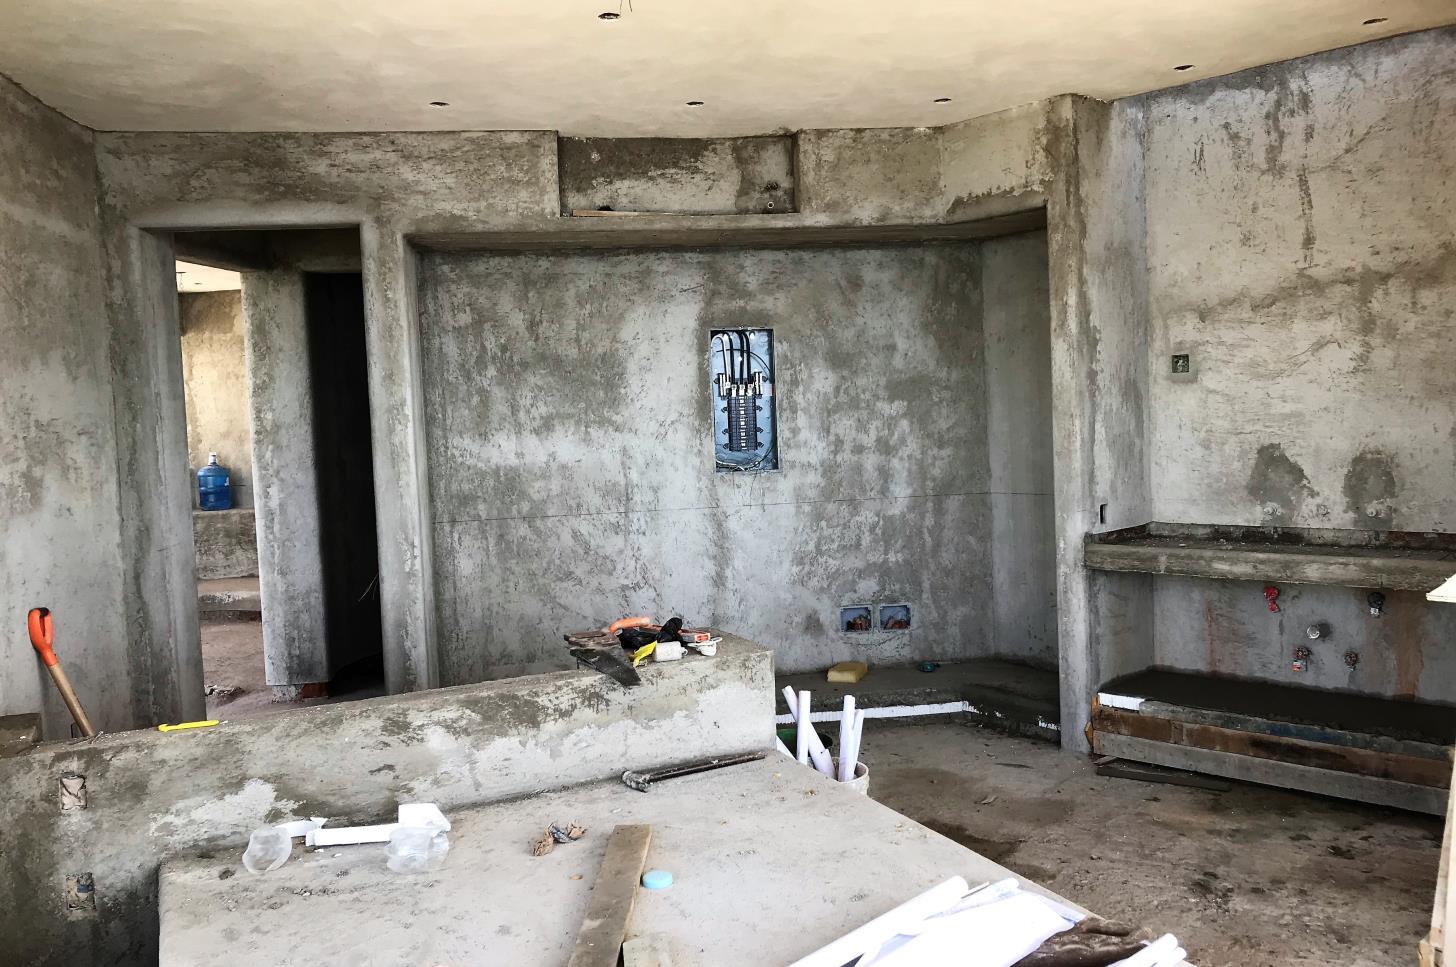 REPORTE-FOTOGRAFICO-PUNTA-MAJAHUA-ZAHA--23-DE-DICIEMBRE-DEL-2017-015.jpg